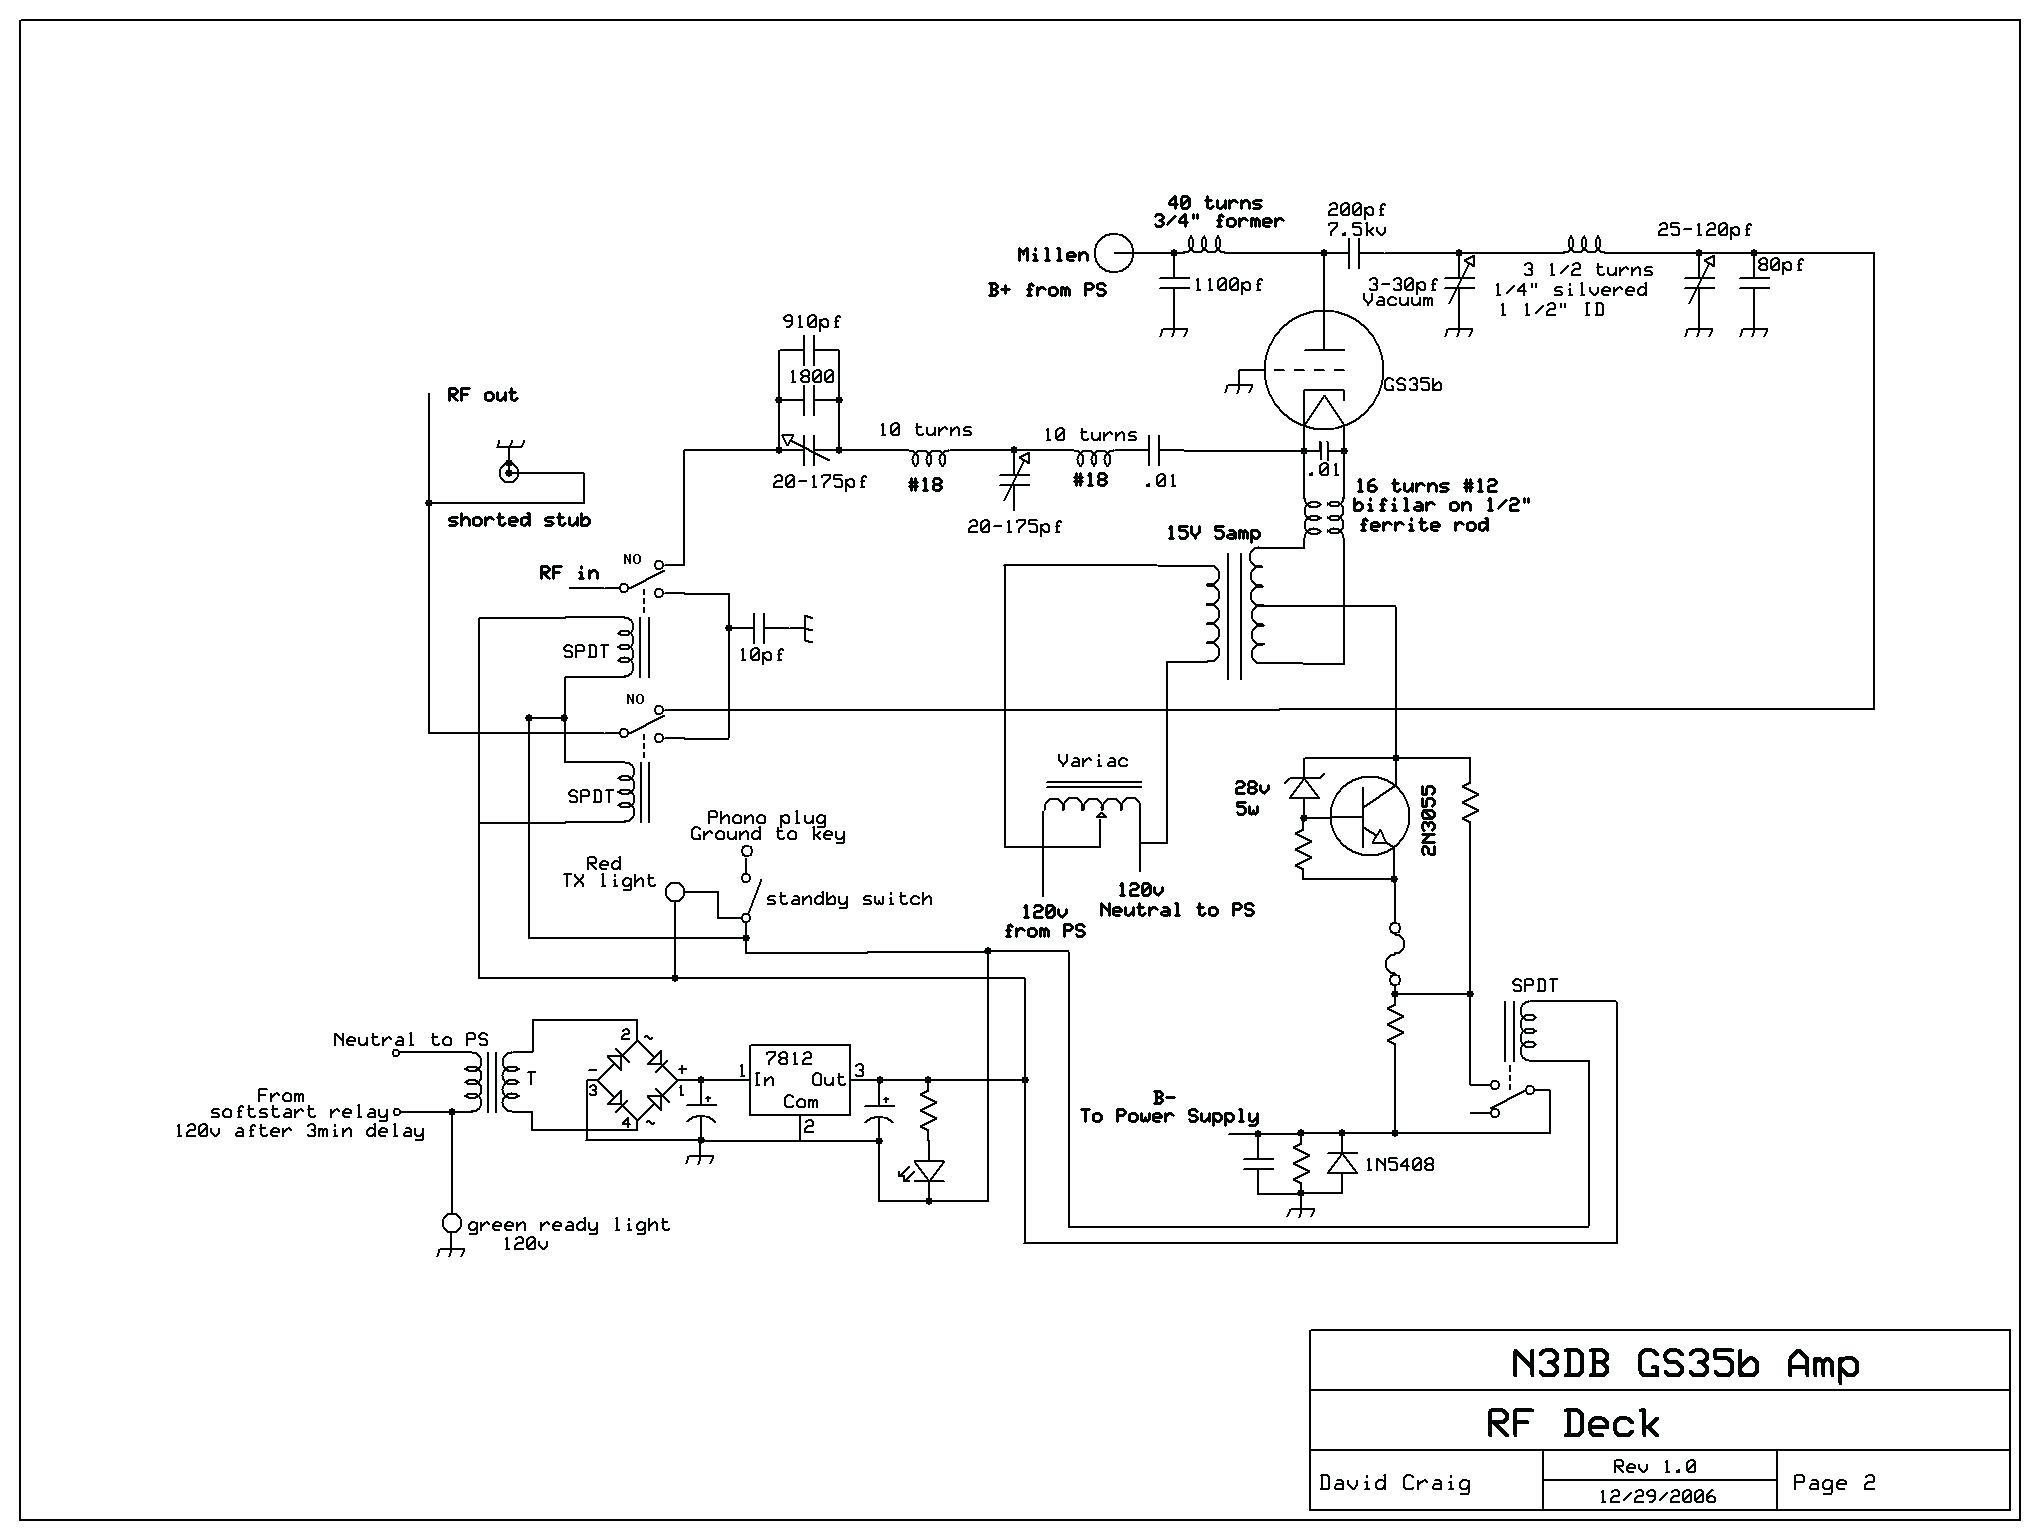 Tork photocell 2001 wiring diagram diagram tork photocell wiring diagram unique image cheapraybanclubmaster Choice Image